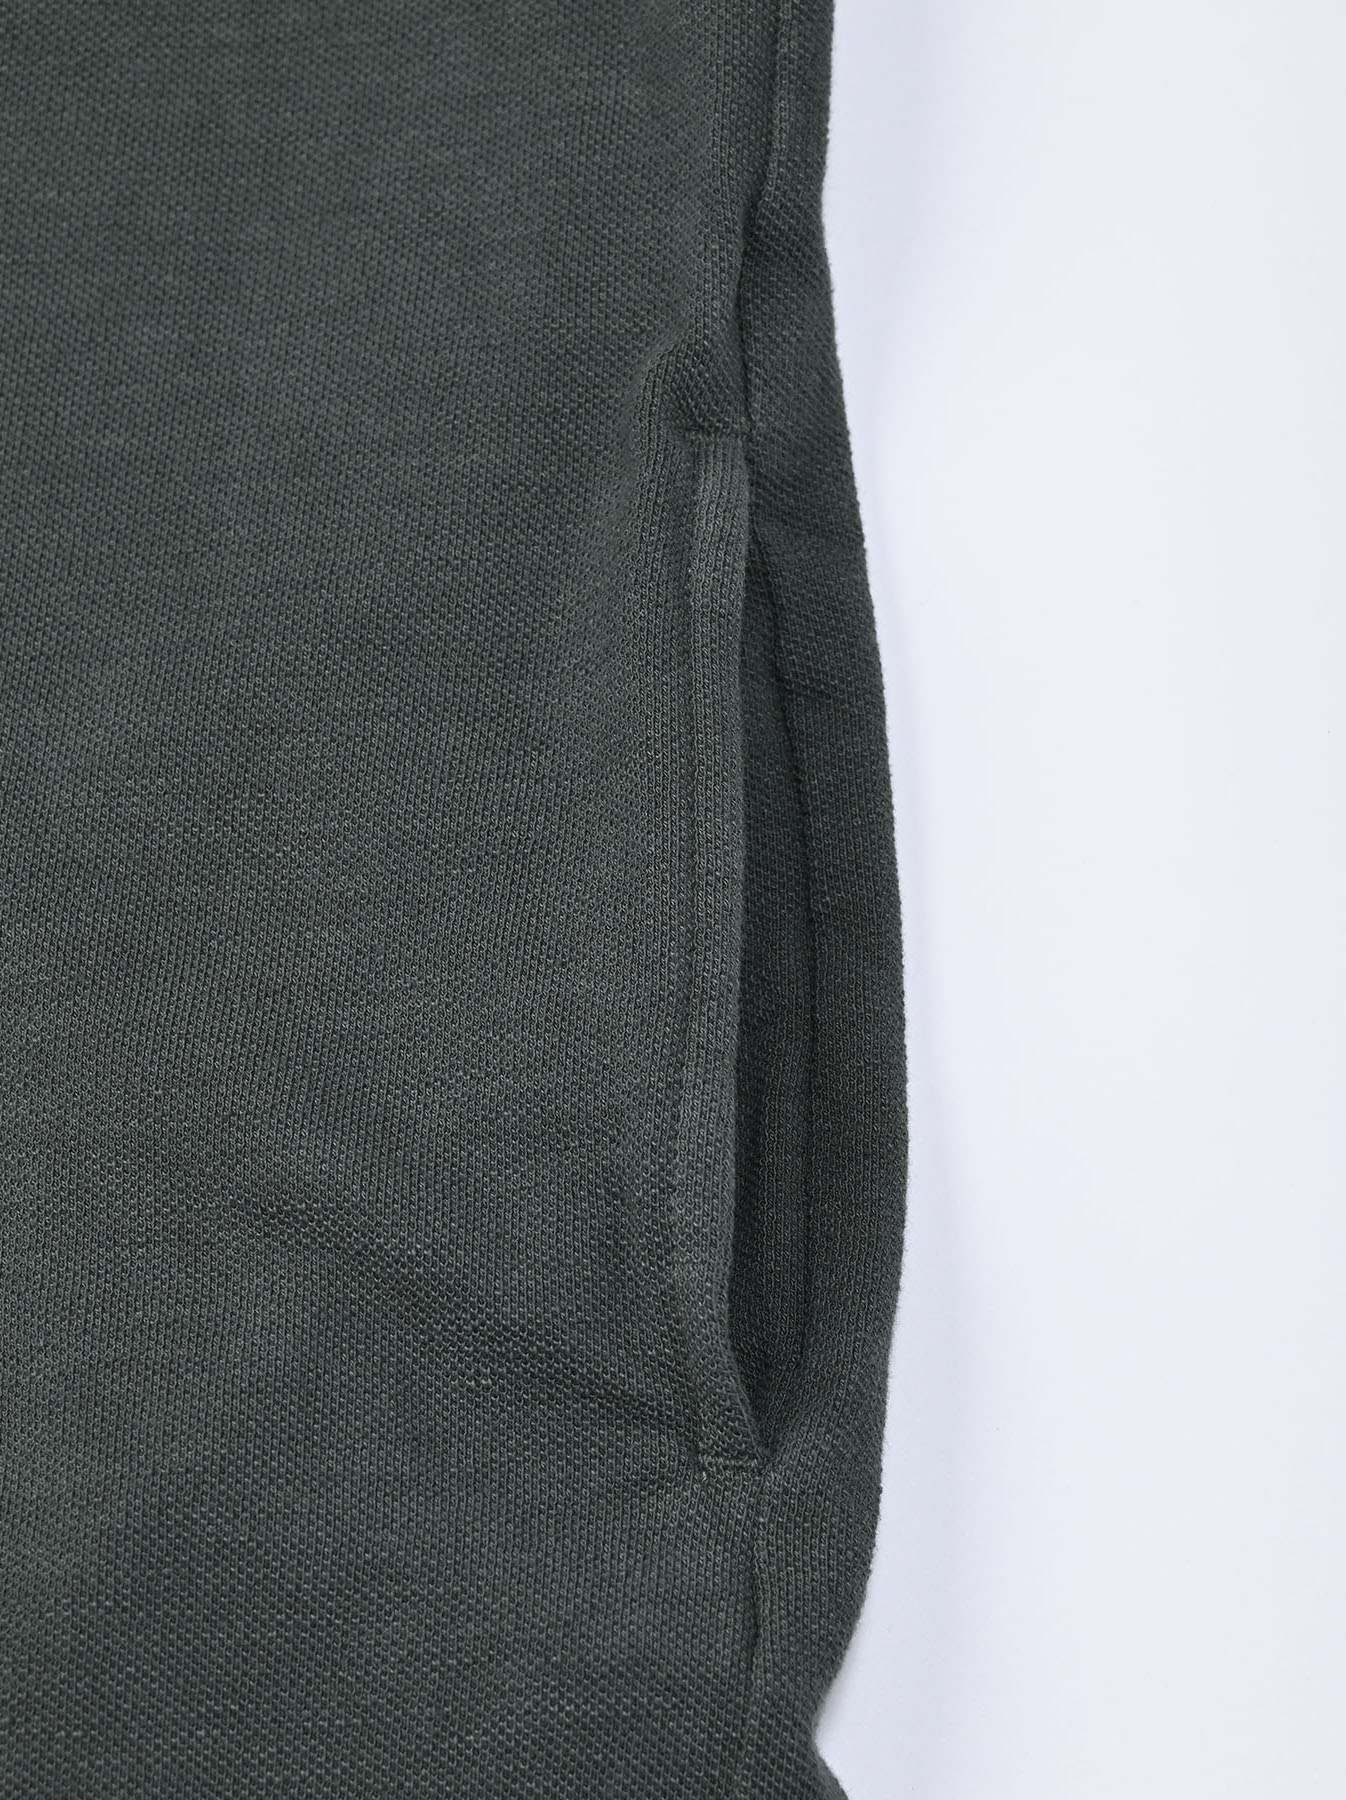 Kanoko Ocean Shiokaze Short-sleeved Polo Dress (0521)-11